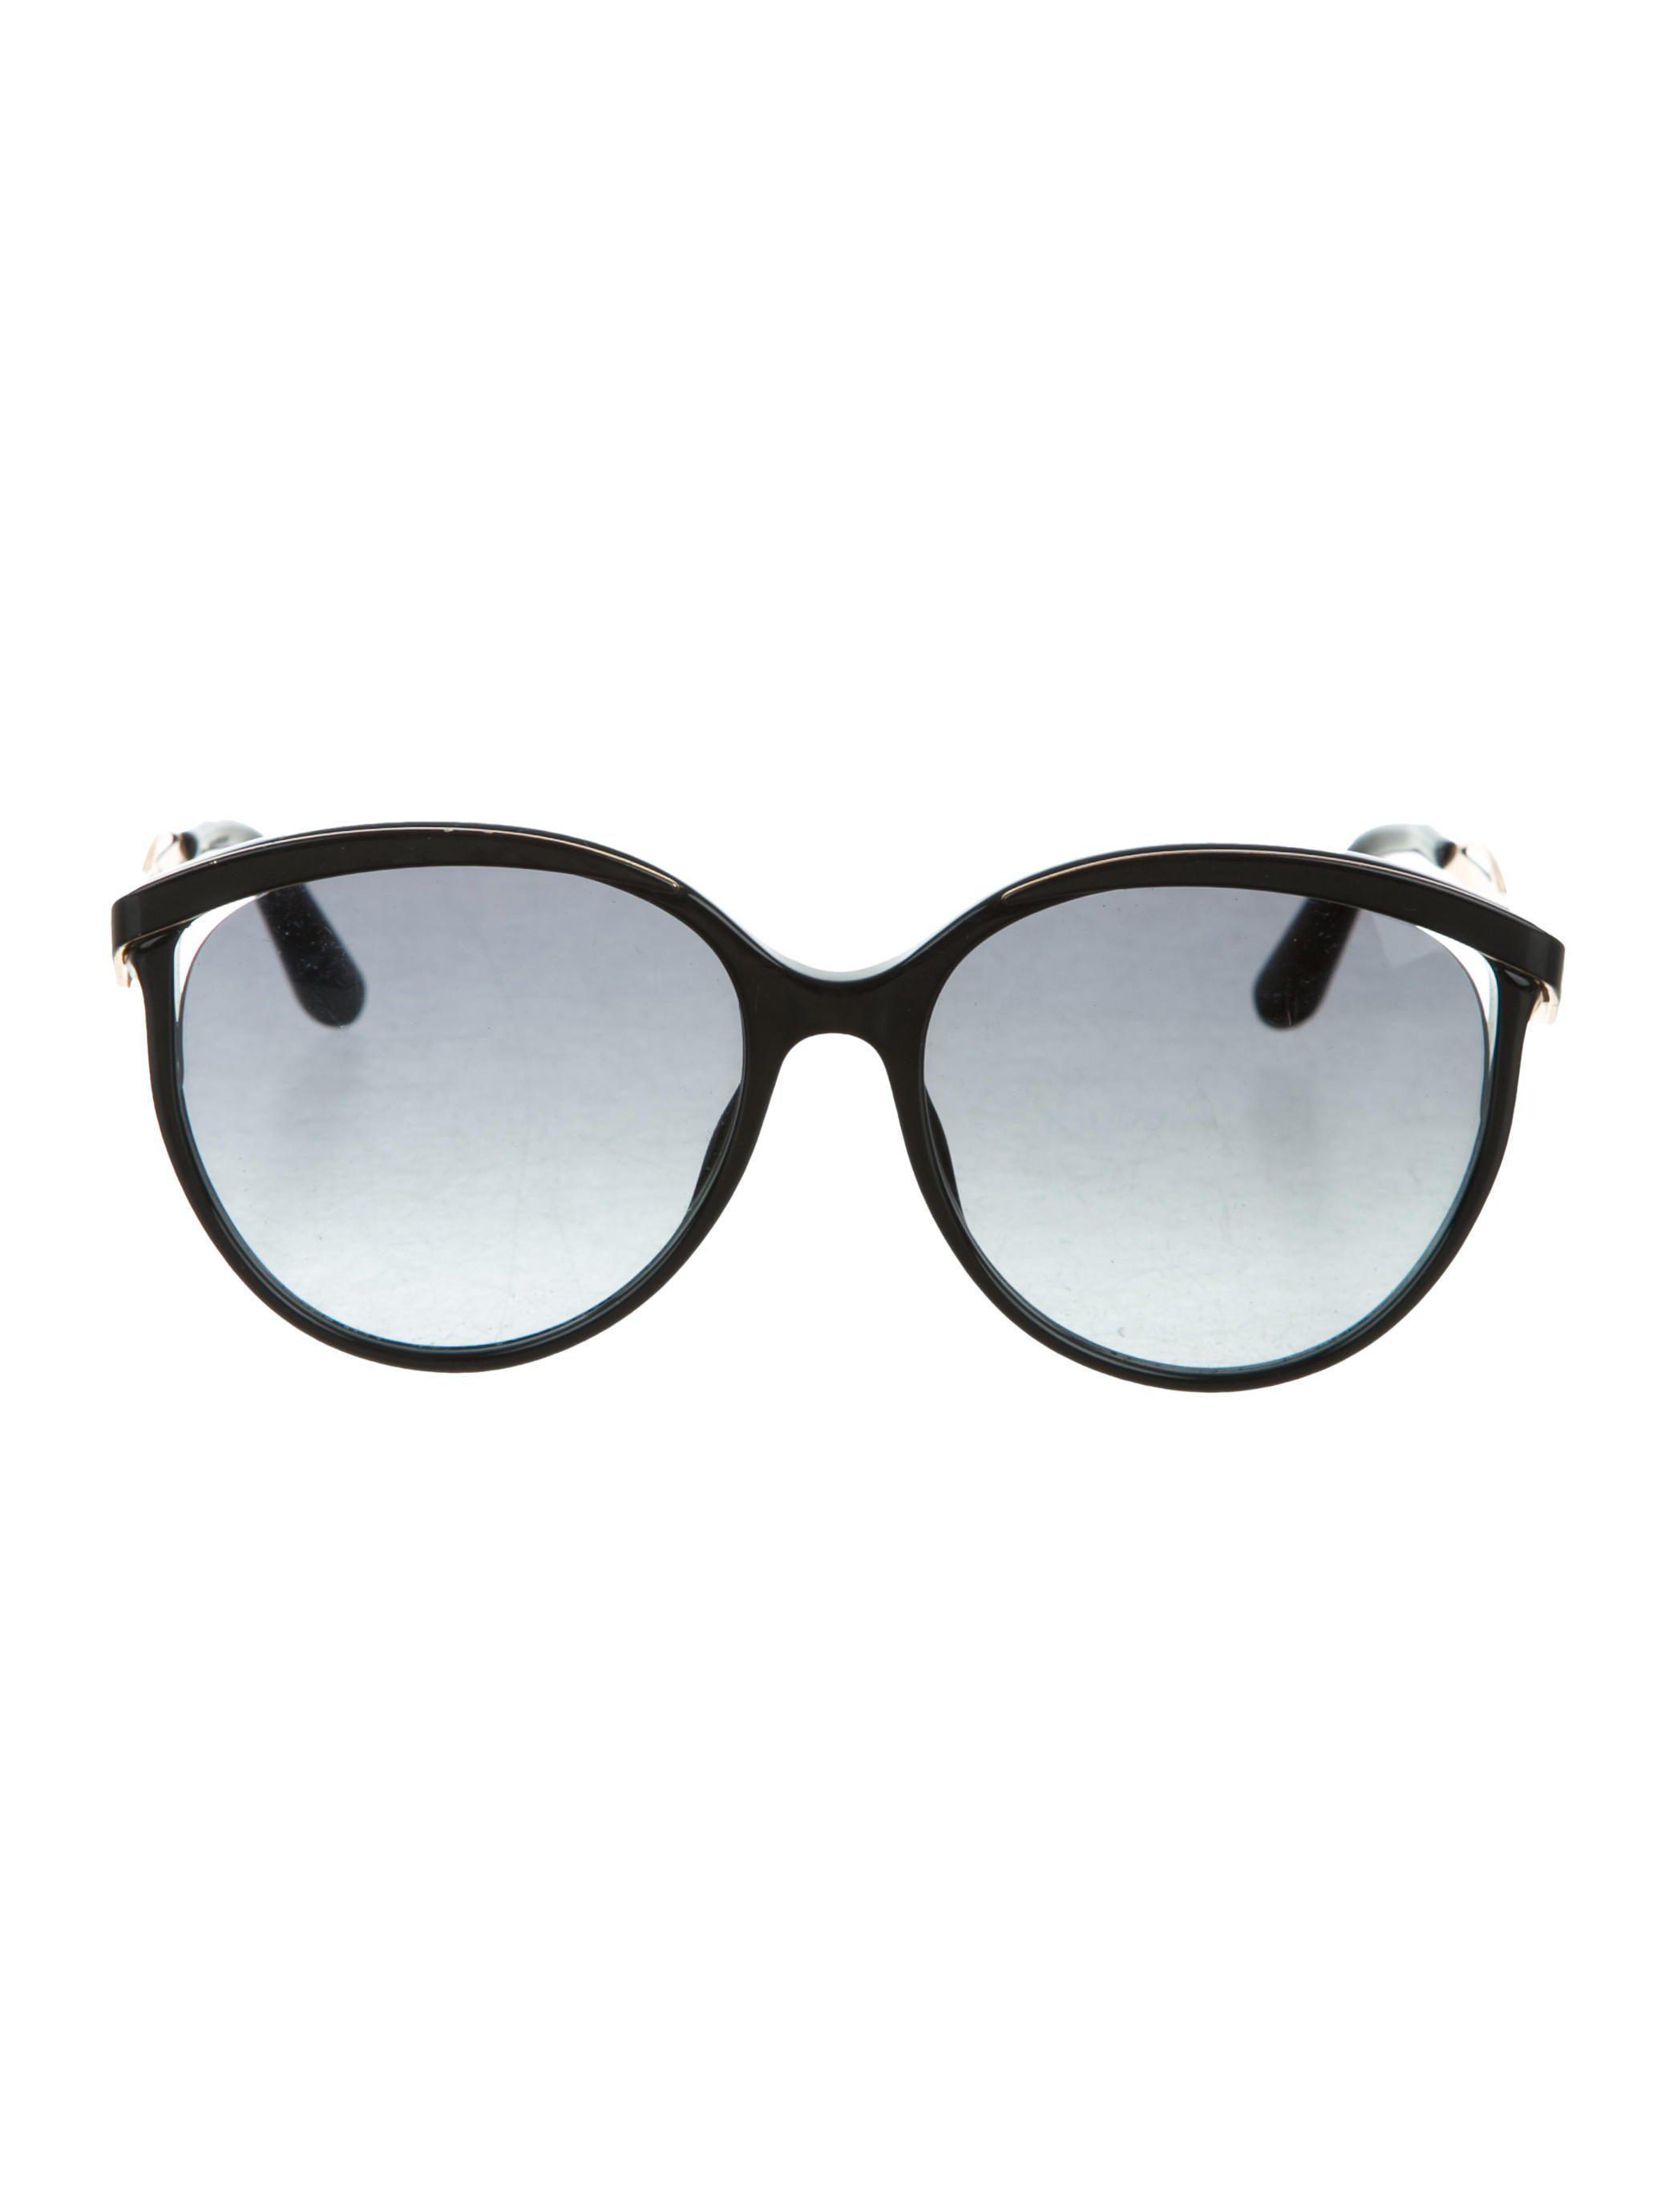 0a35a7857b Lyst - Dior Metal Eyes 1 Sunglasses Black in Metallic